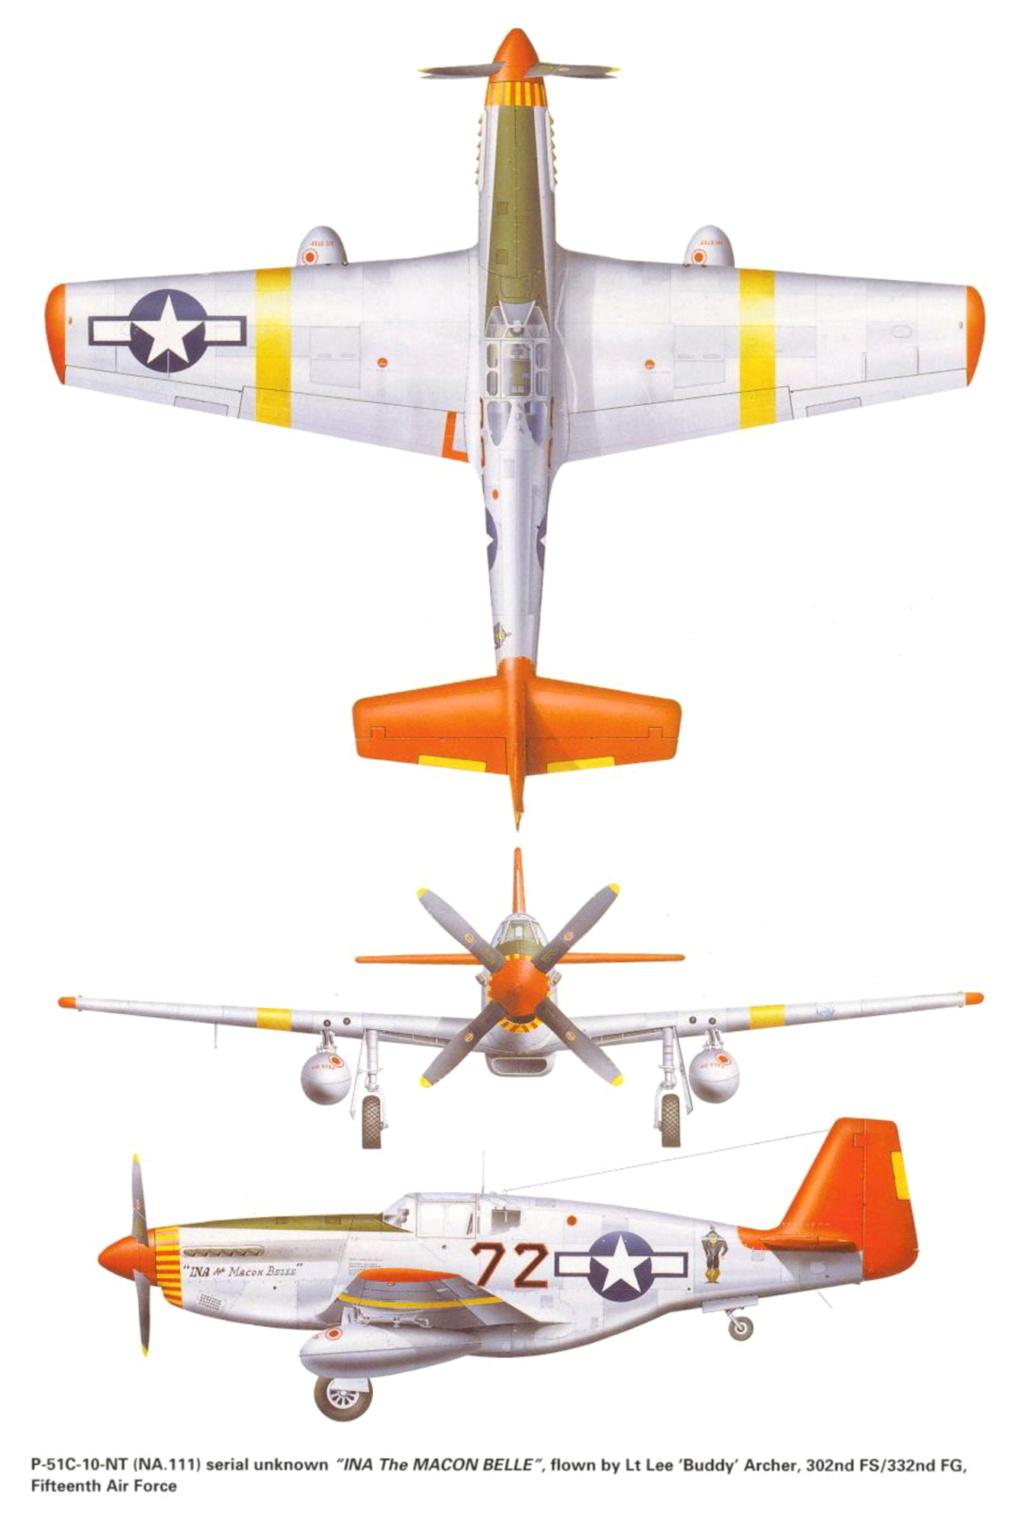 NORTH AMERICAN P-51 MUSTANG P-51-r10